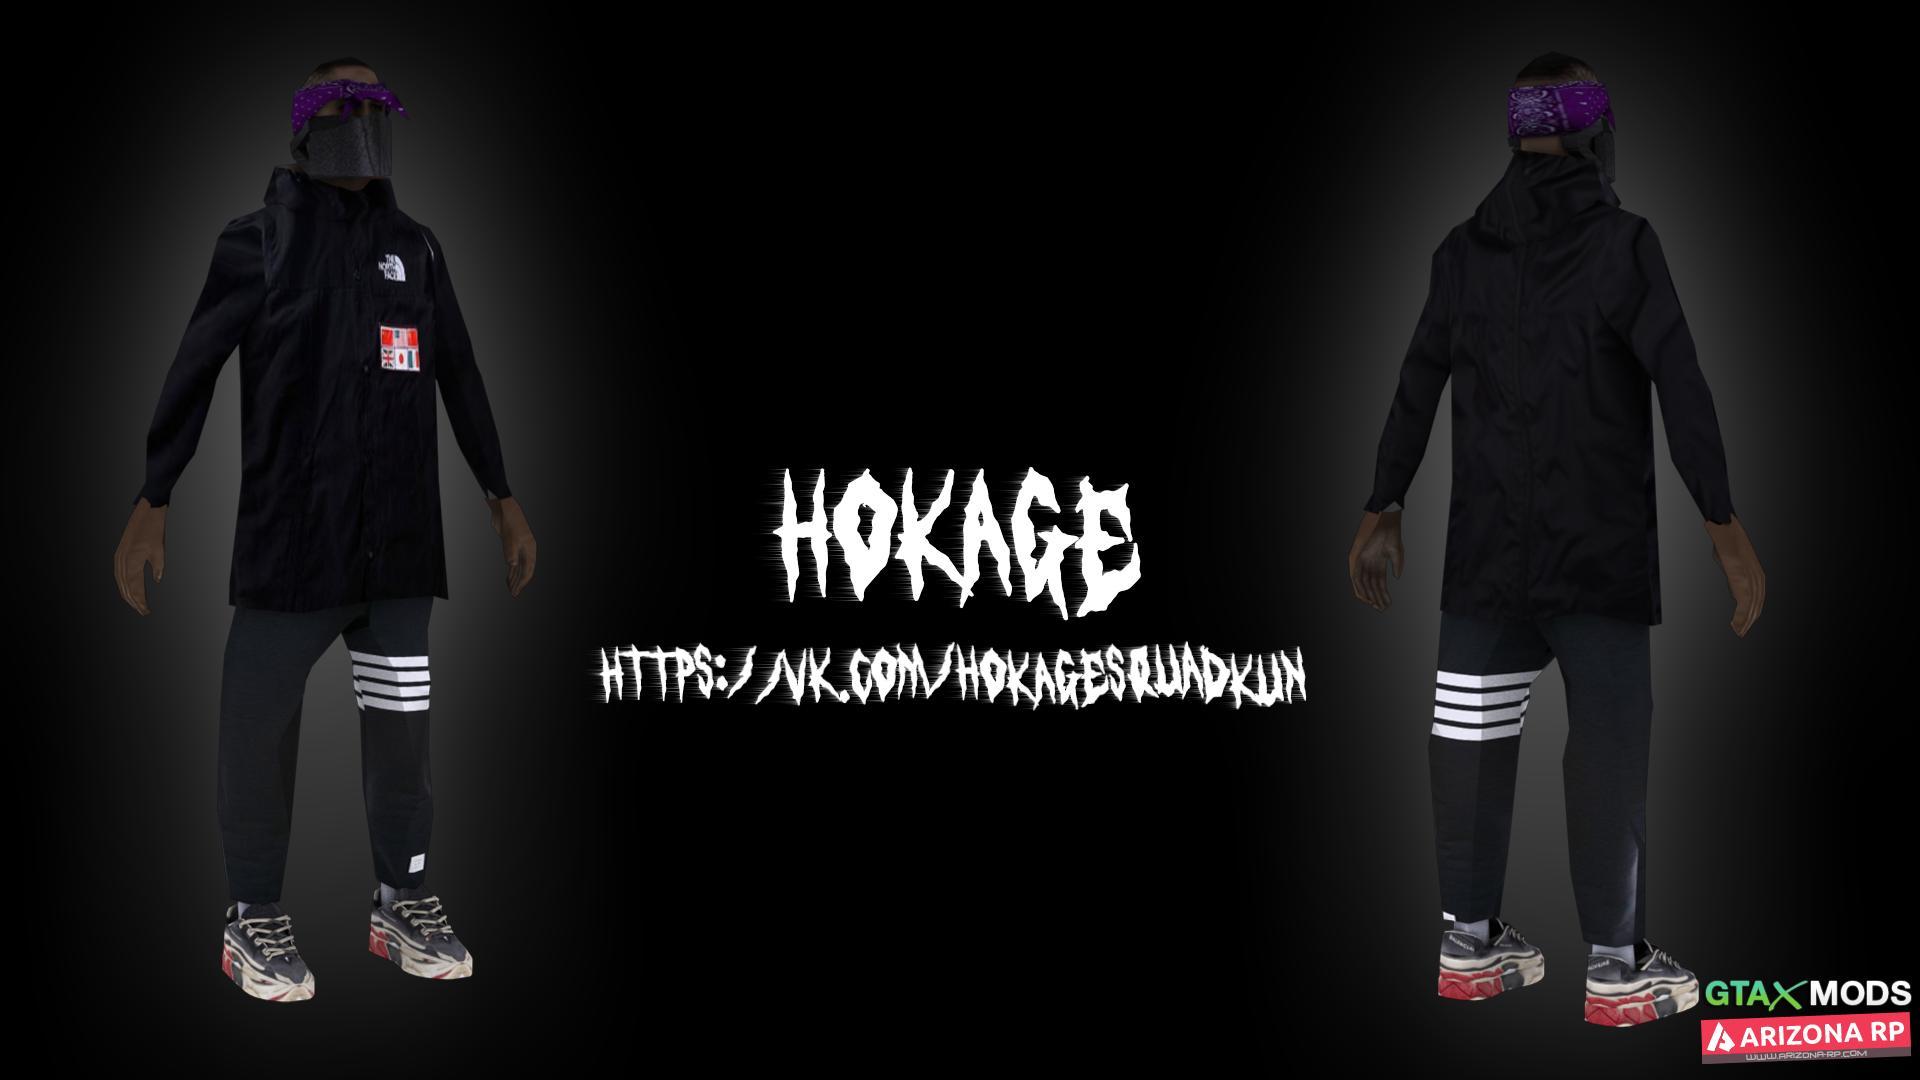 ballas1 | HokageSquad